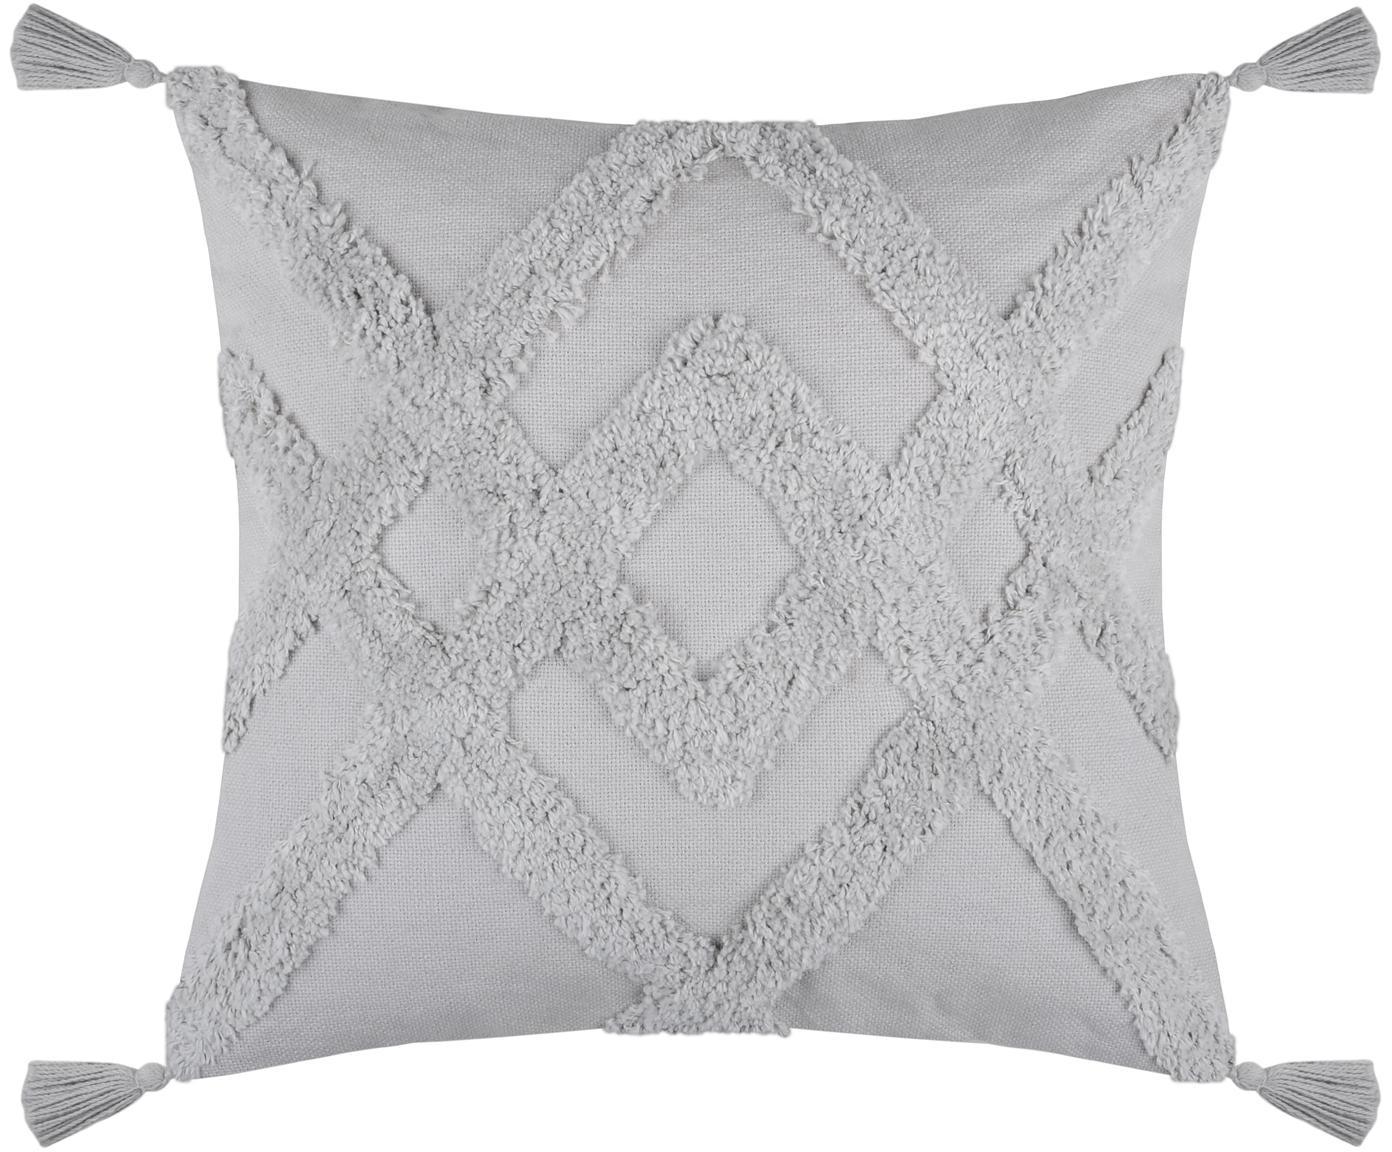 Cojín texturizado Tiksi, estilo boho, con relleno, Funda: 100%algodón, Gris, An 40 x L 40 cm